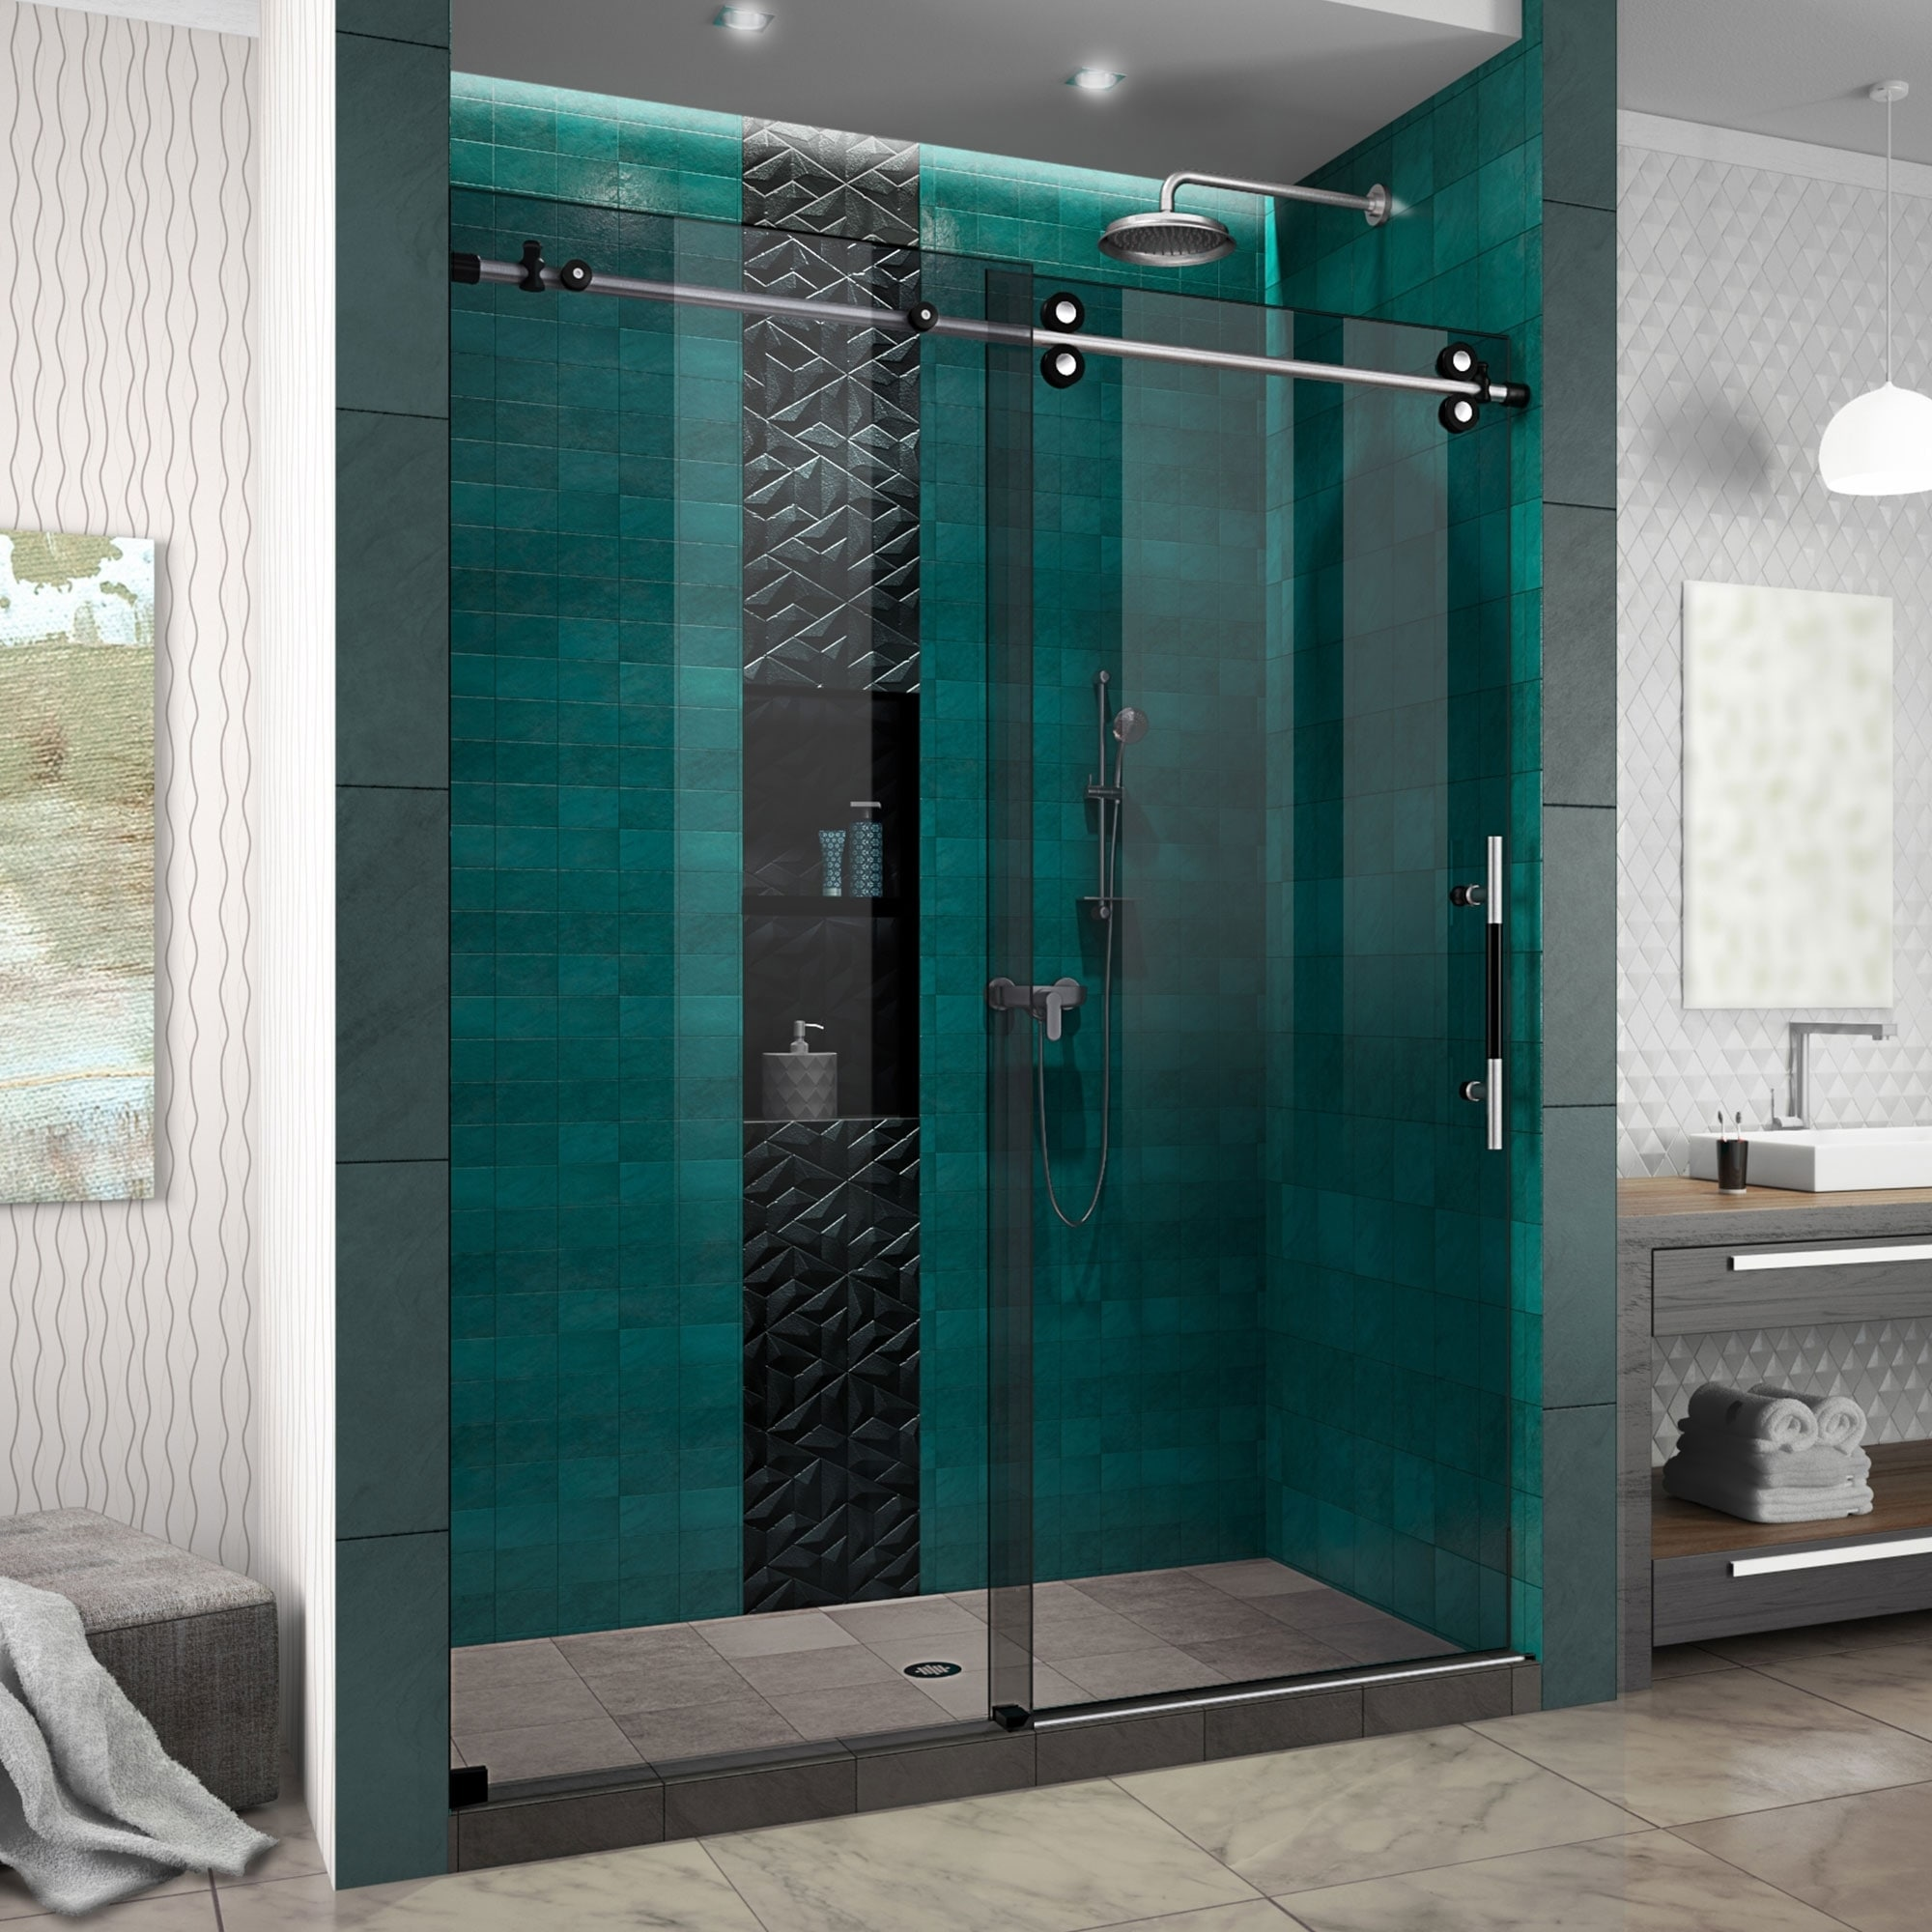 Dreamline Enigma Xo 56 60 In W X 76 In H Fully Frameless Sliding Shower Door Grey Glass 56 60 W